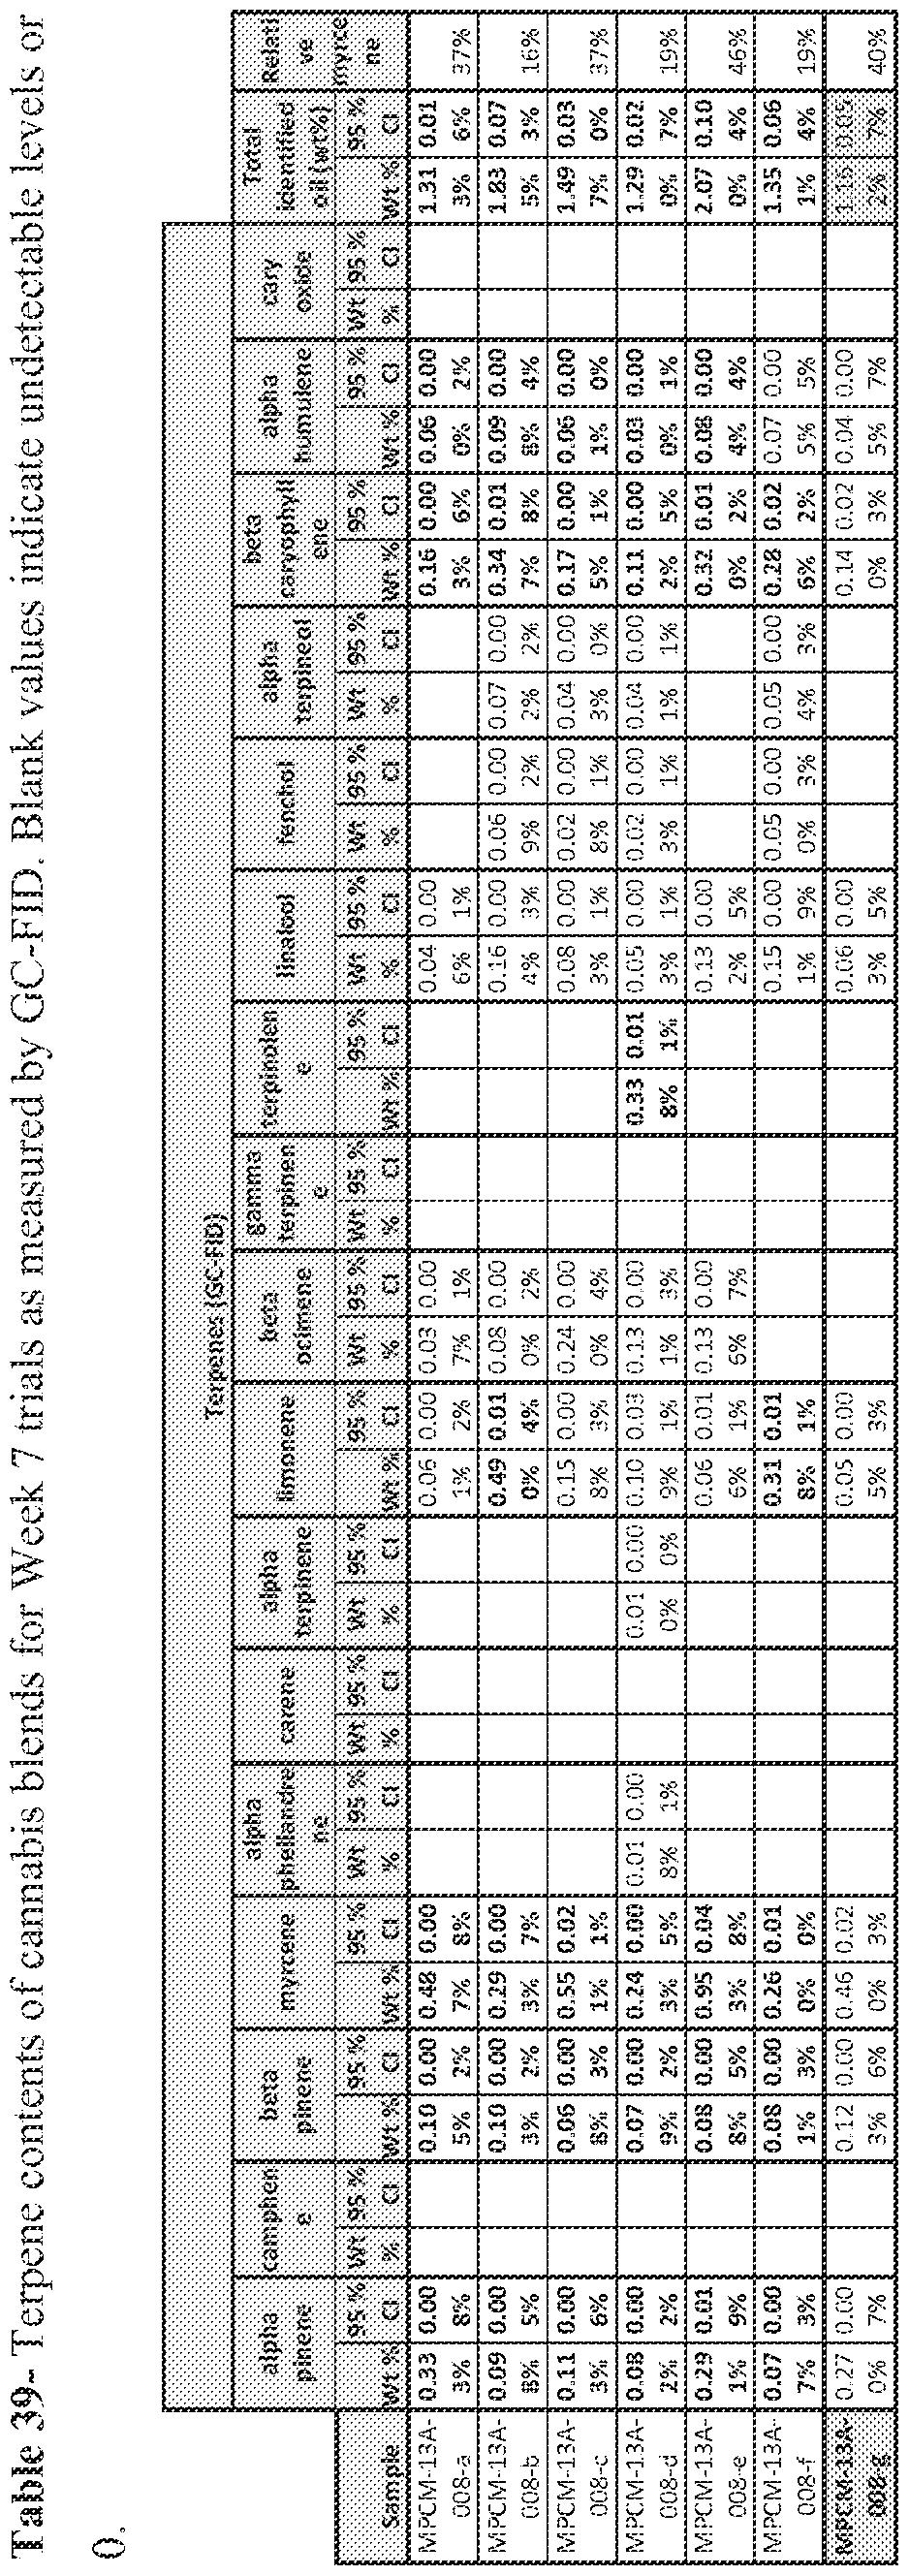 Min 4 Qty 5, PH Pack of 5 Retaining Ring Inv Int Housing